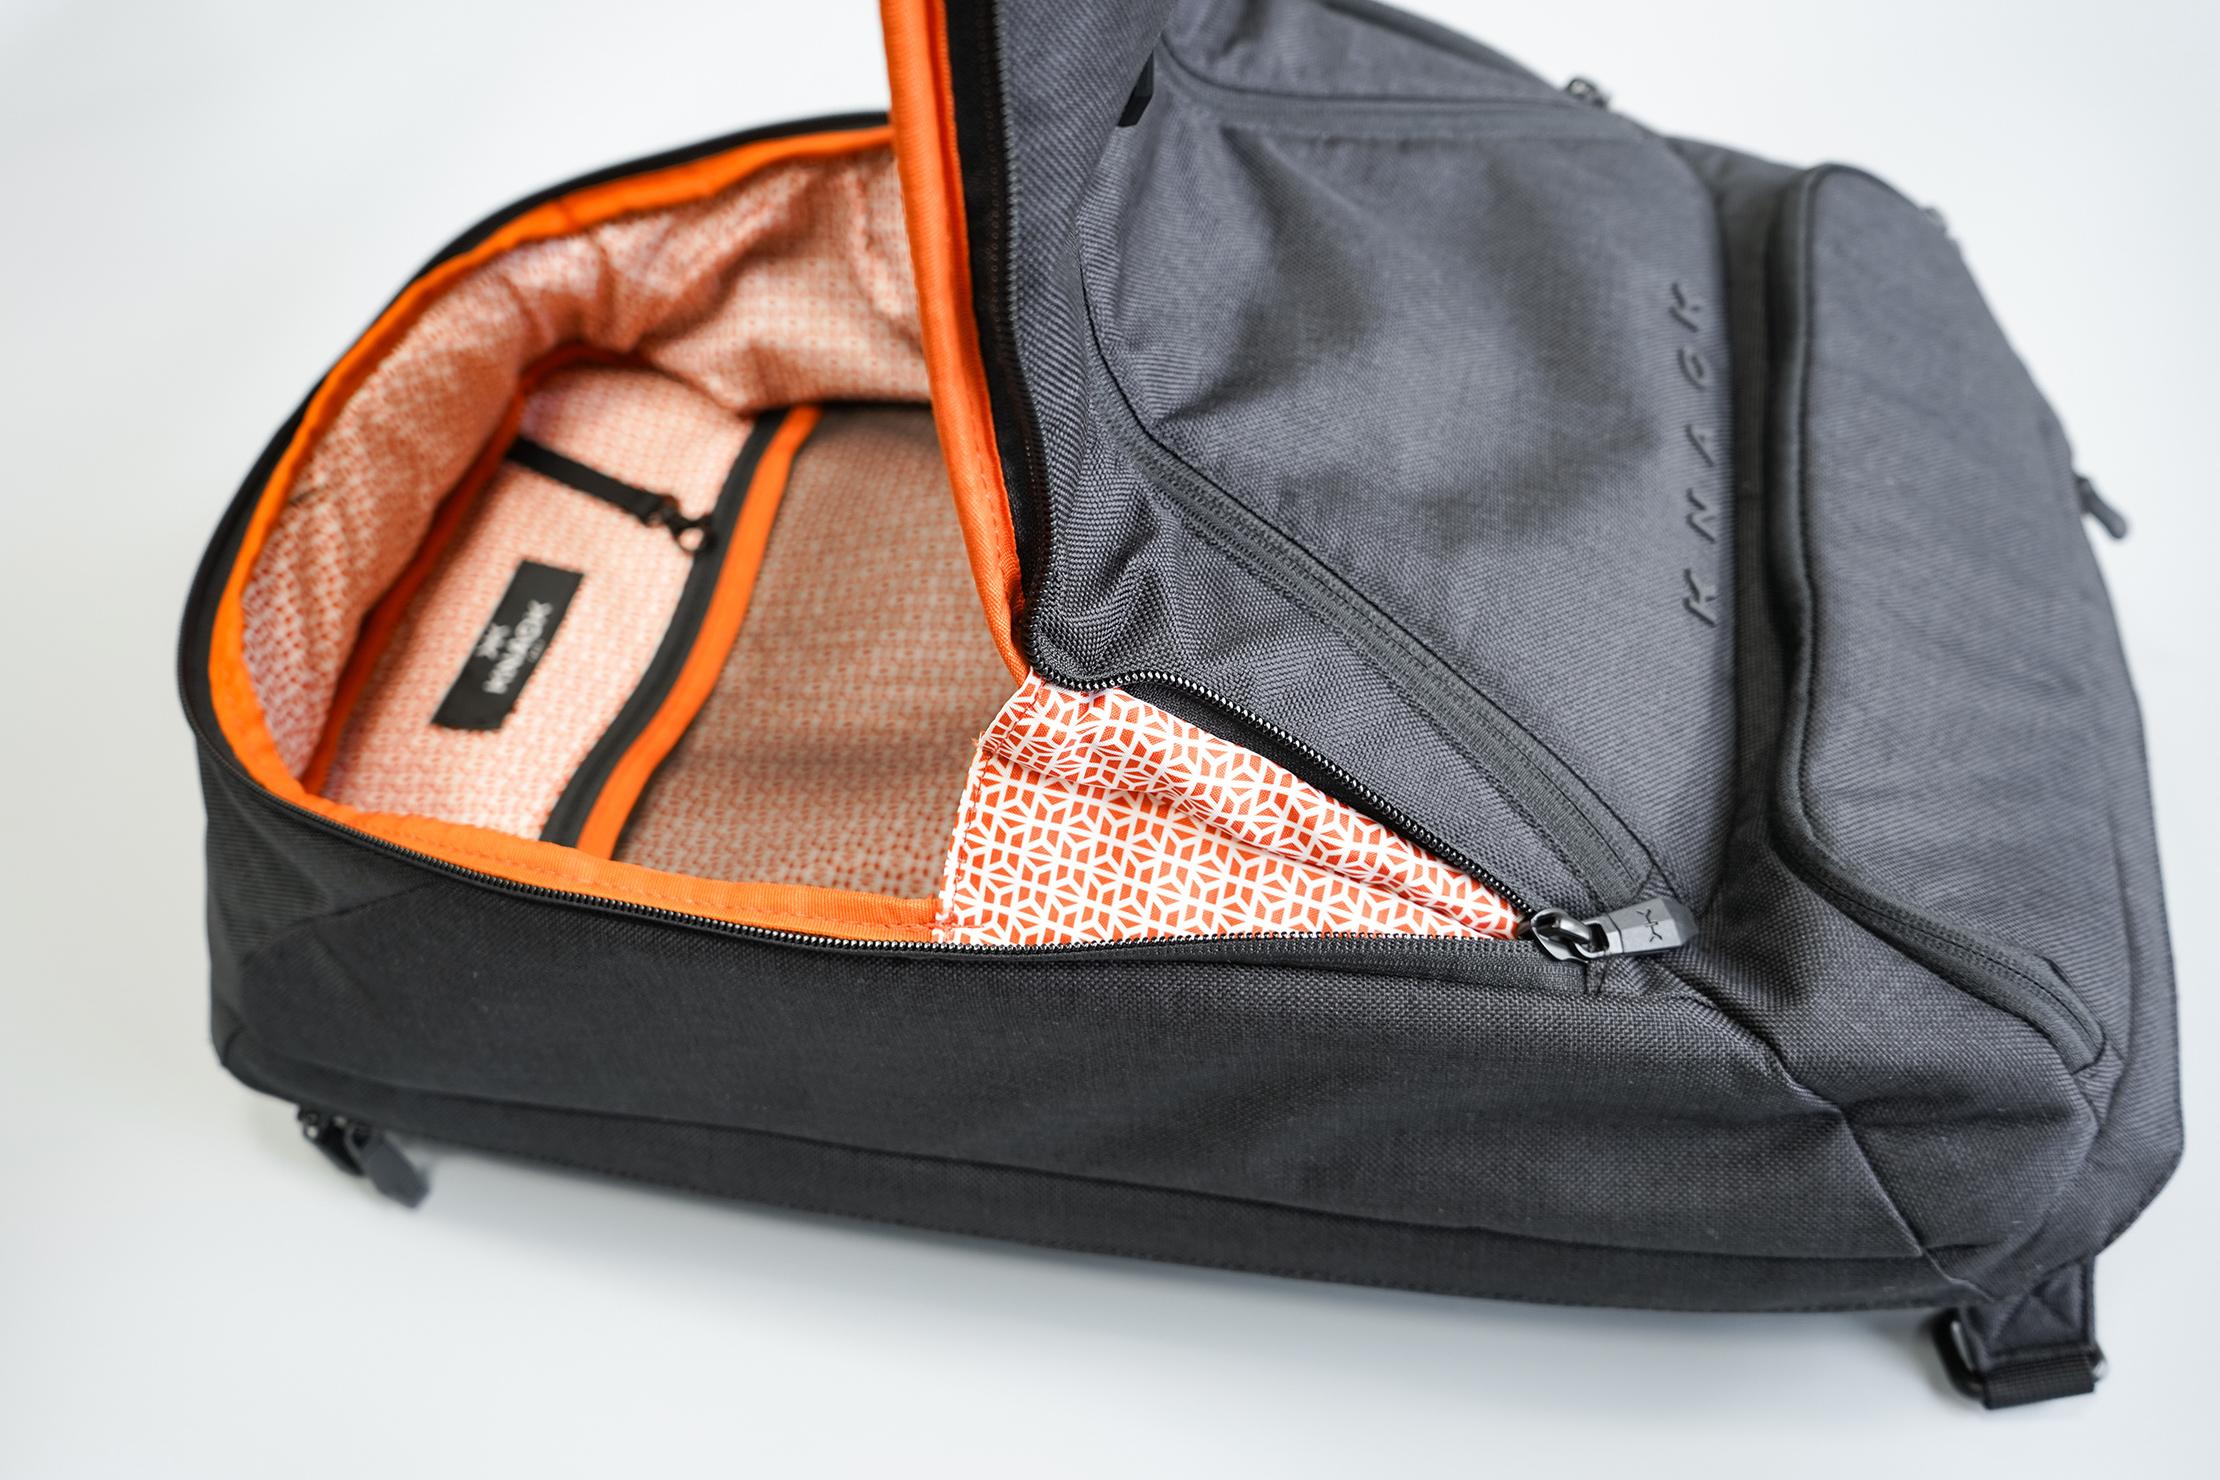 Knack Large Expandable Pack Nylon Webbing